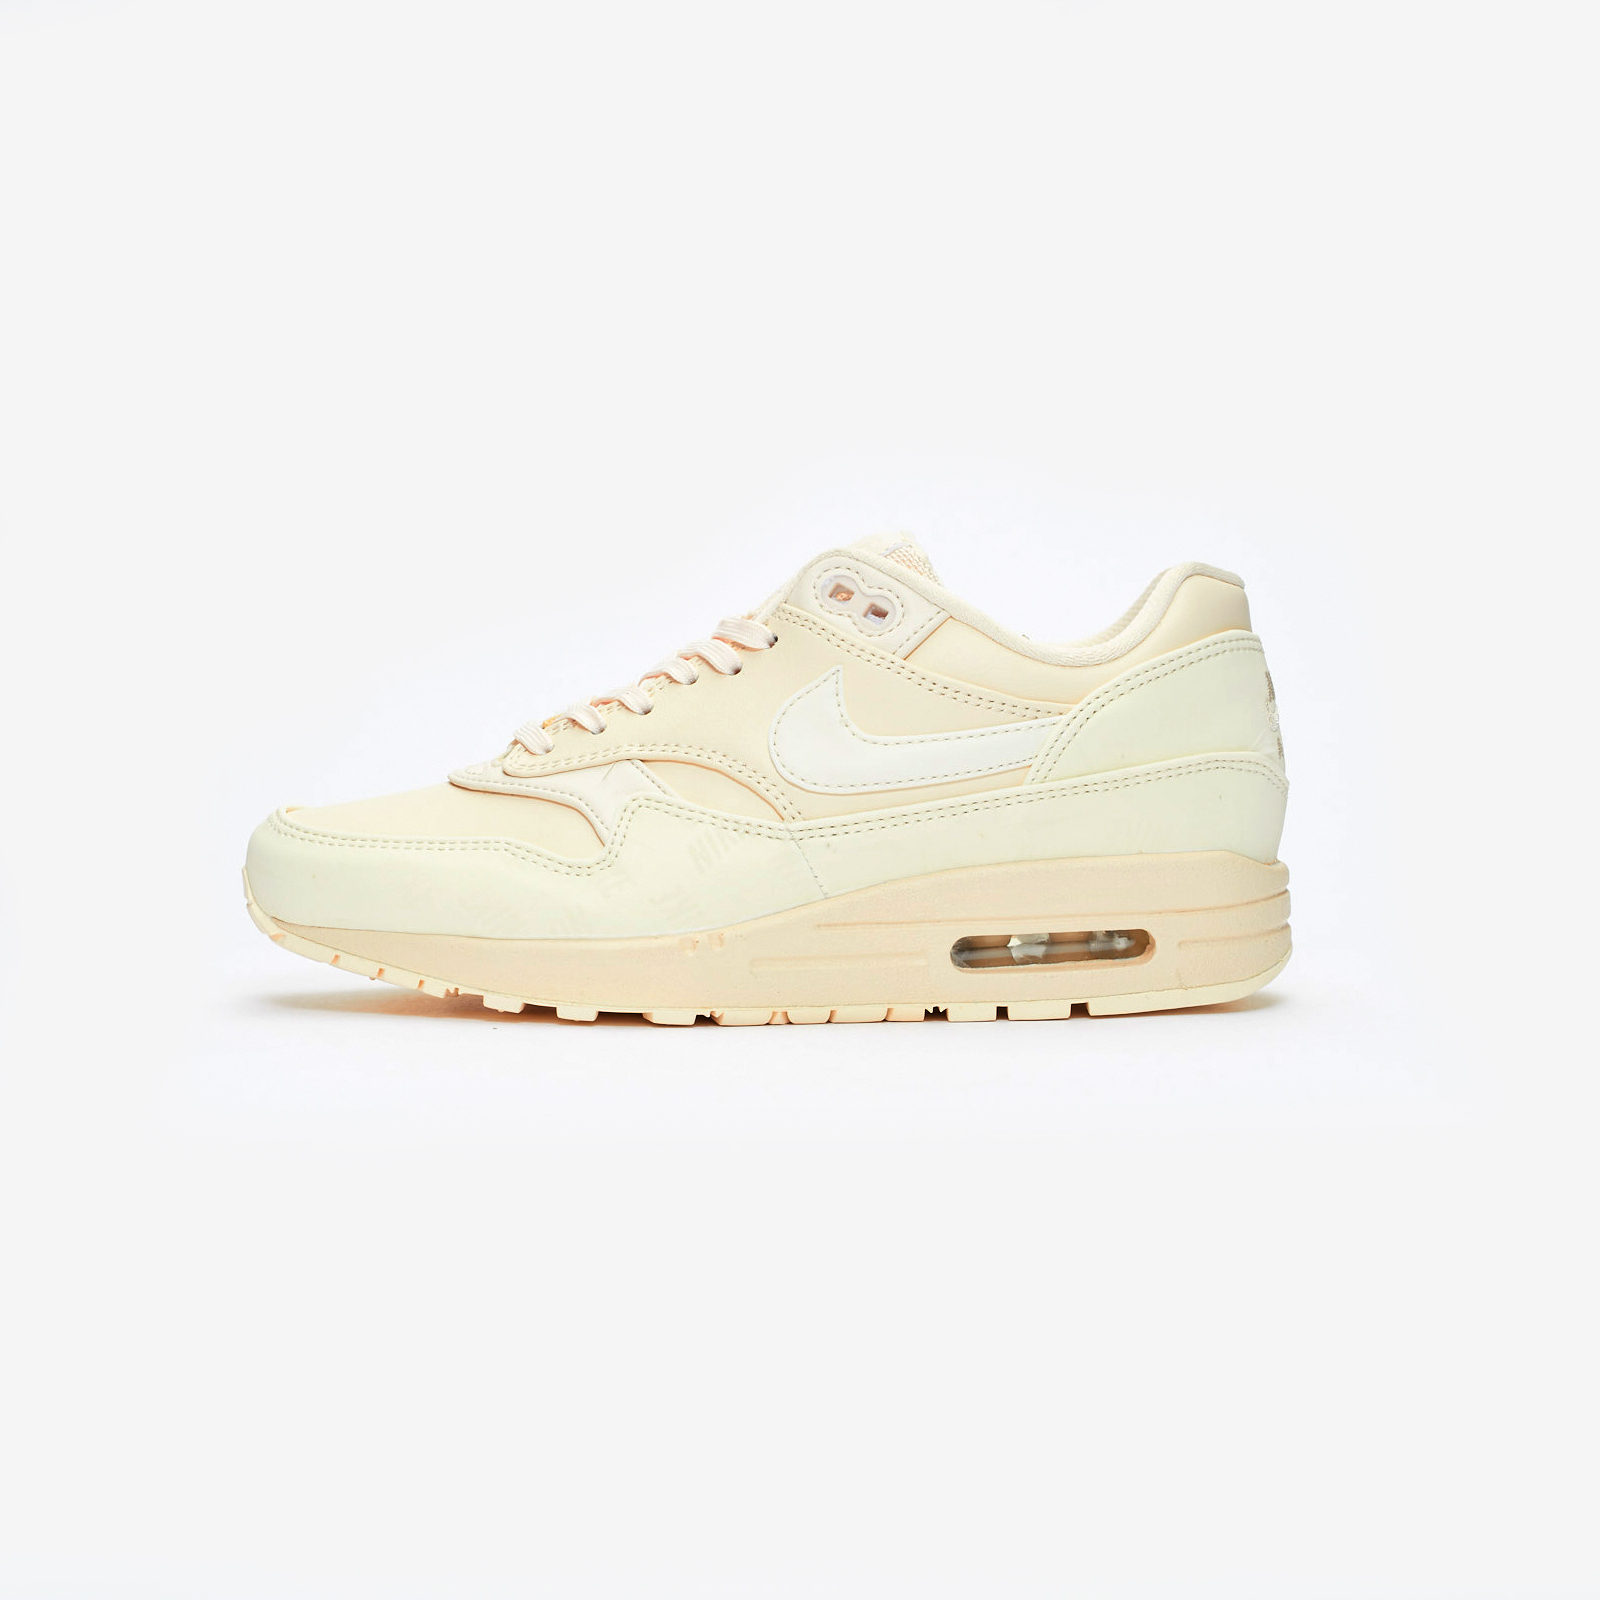 619feb69c9 Nike Wmns Air Max 1 LX - 917691-801 - Sneakersnstuff | sneakers &  streetwear online since 1999